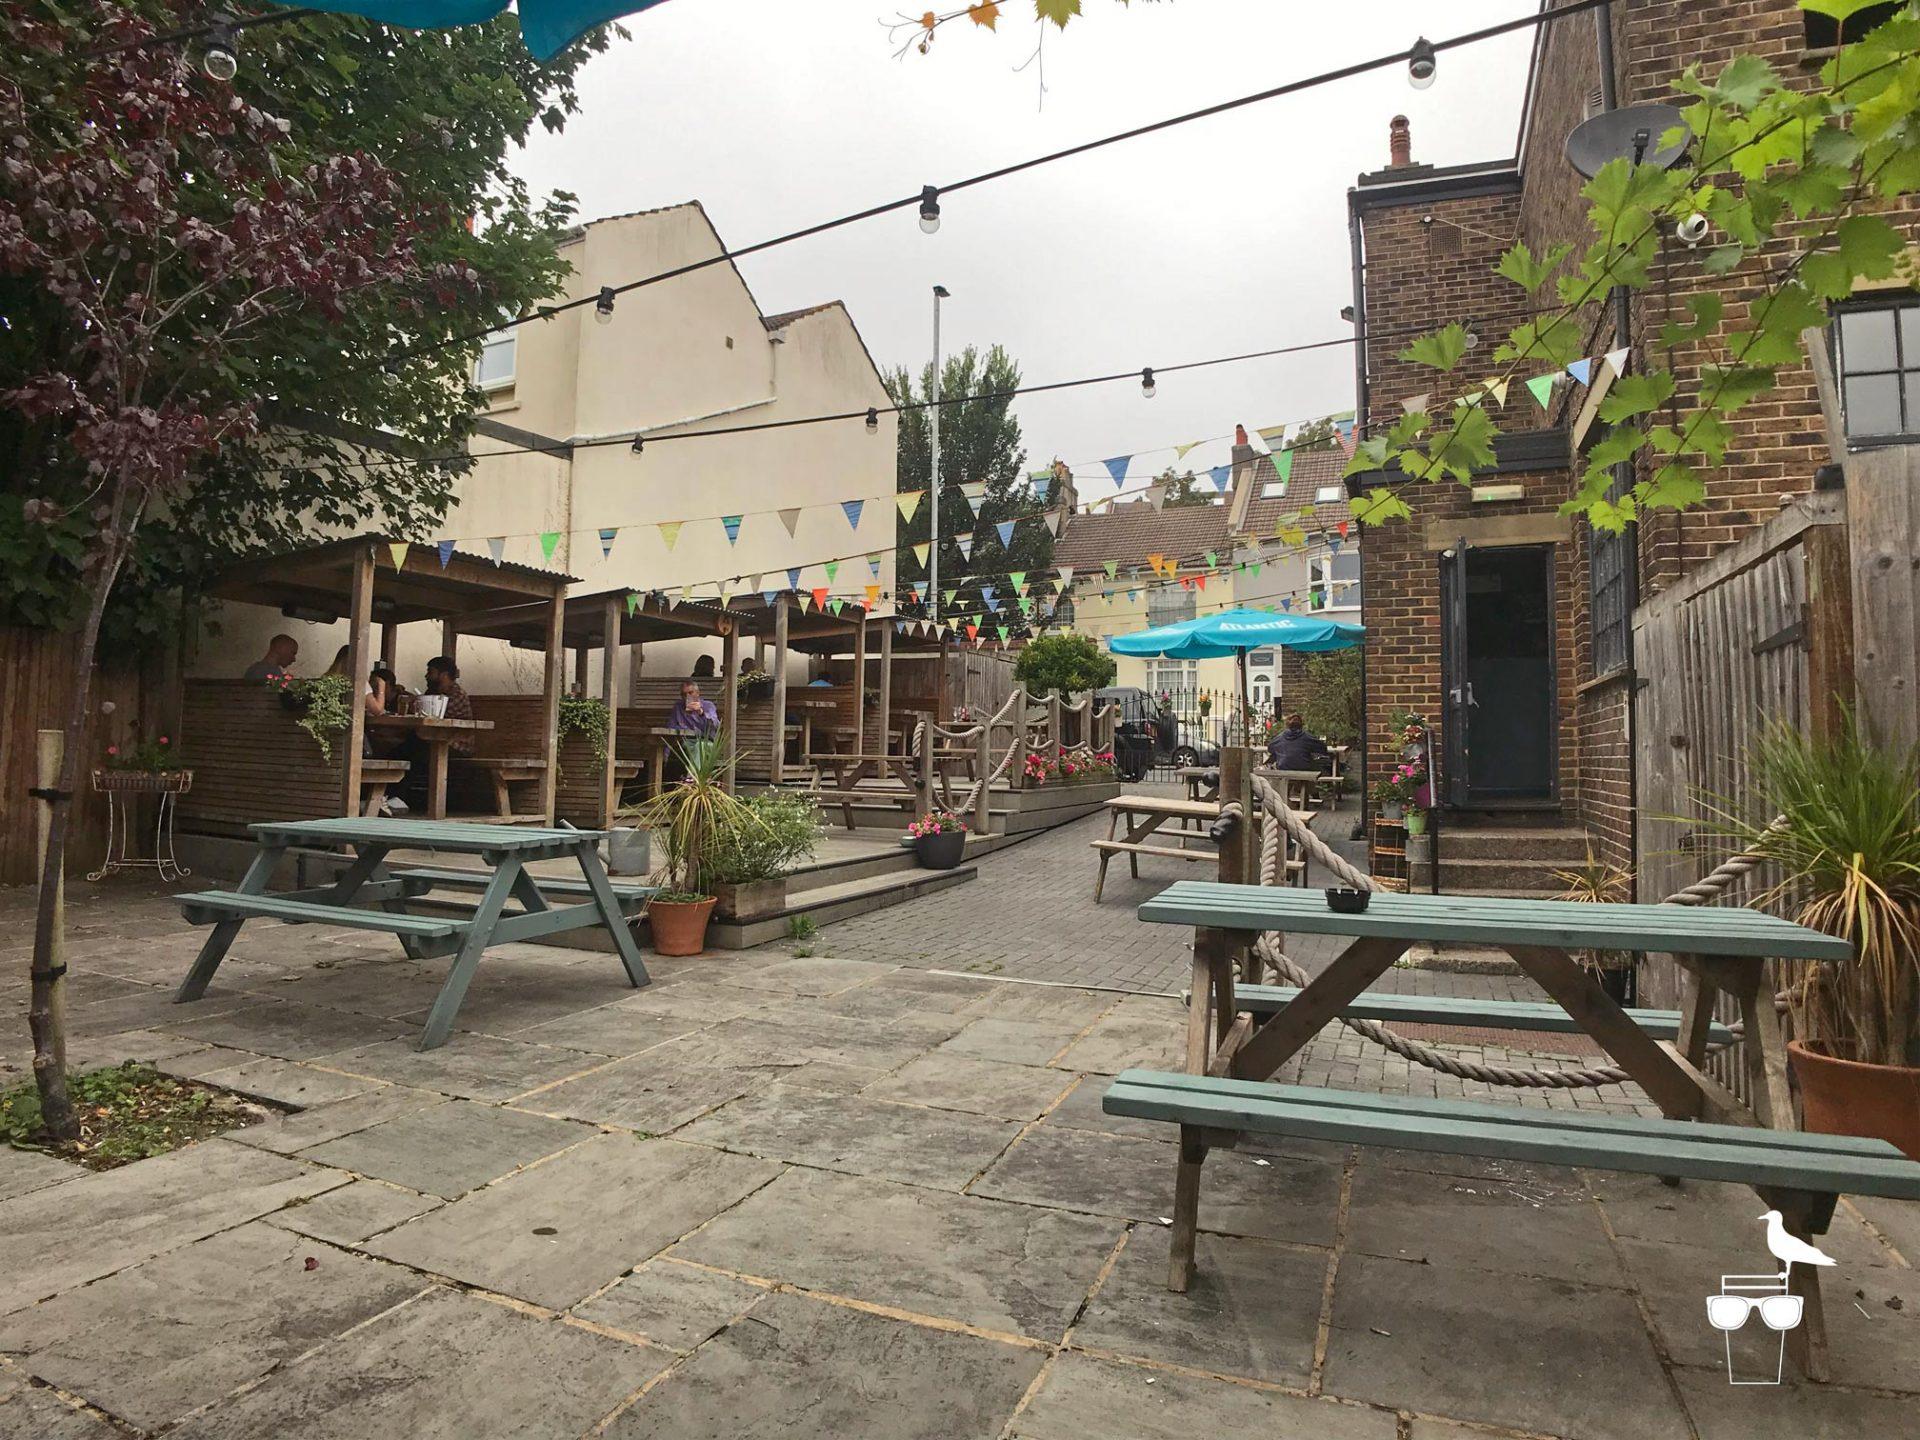 martha-gunn-pub-brighton-outside-garden-1